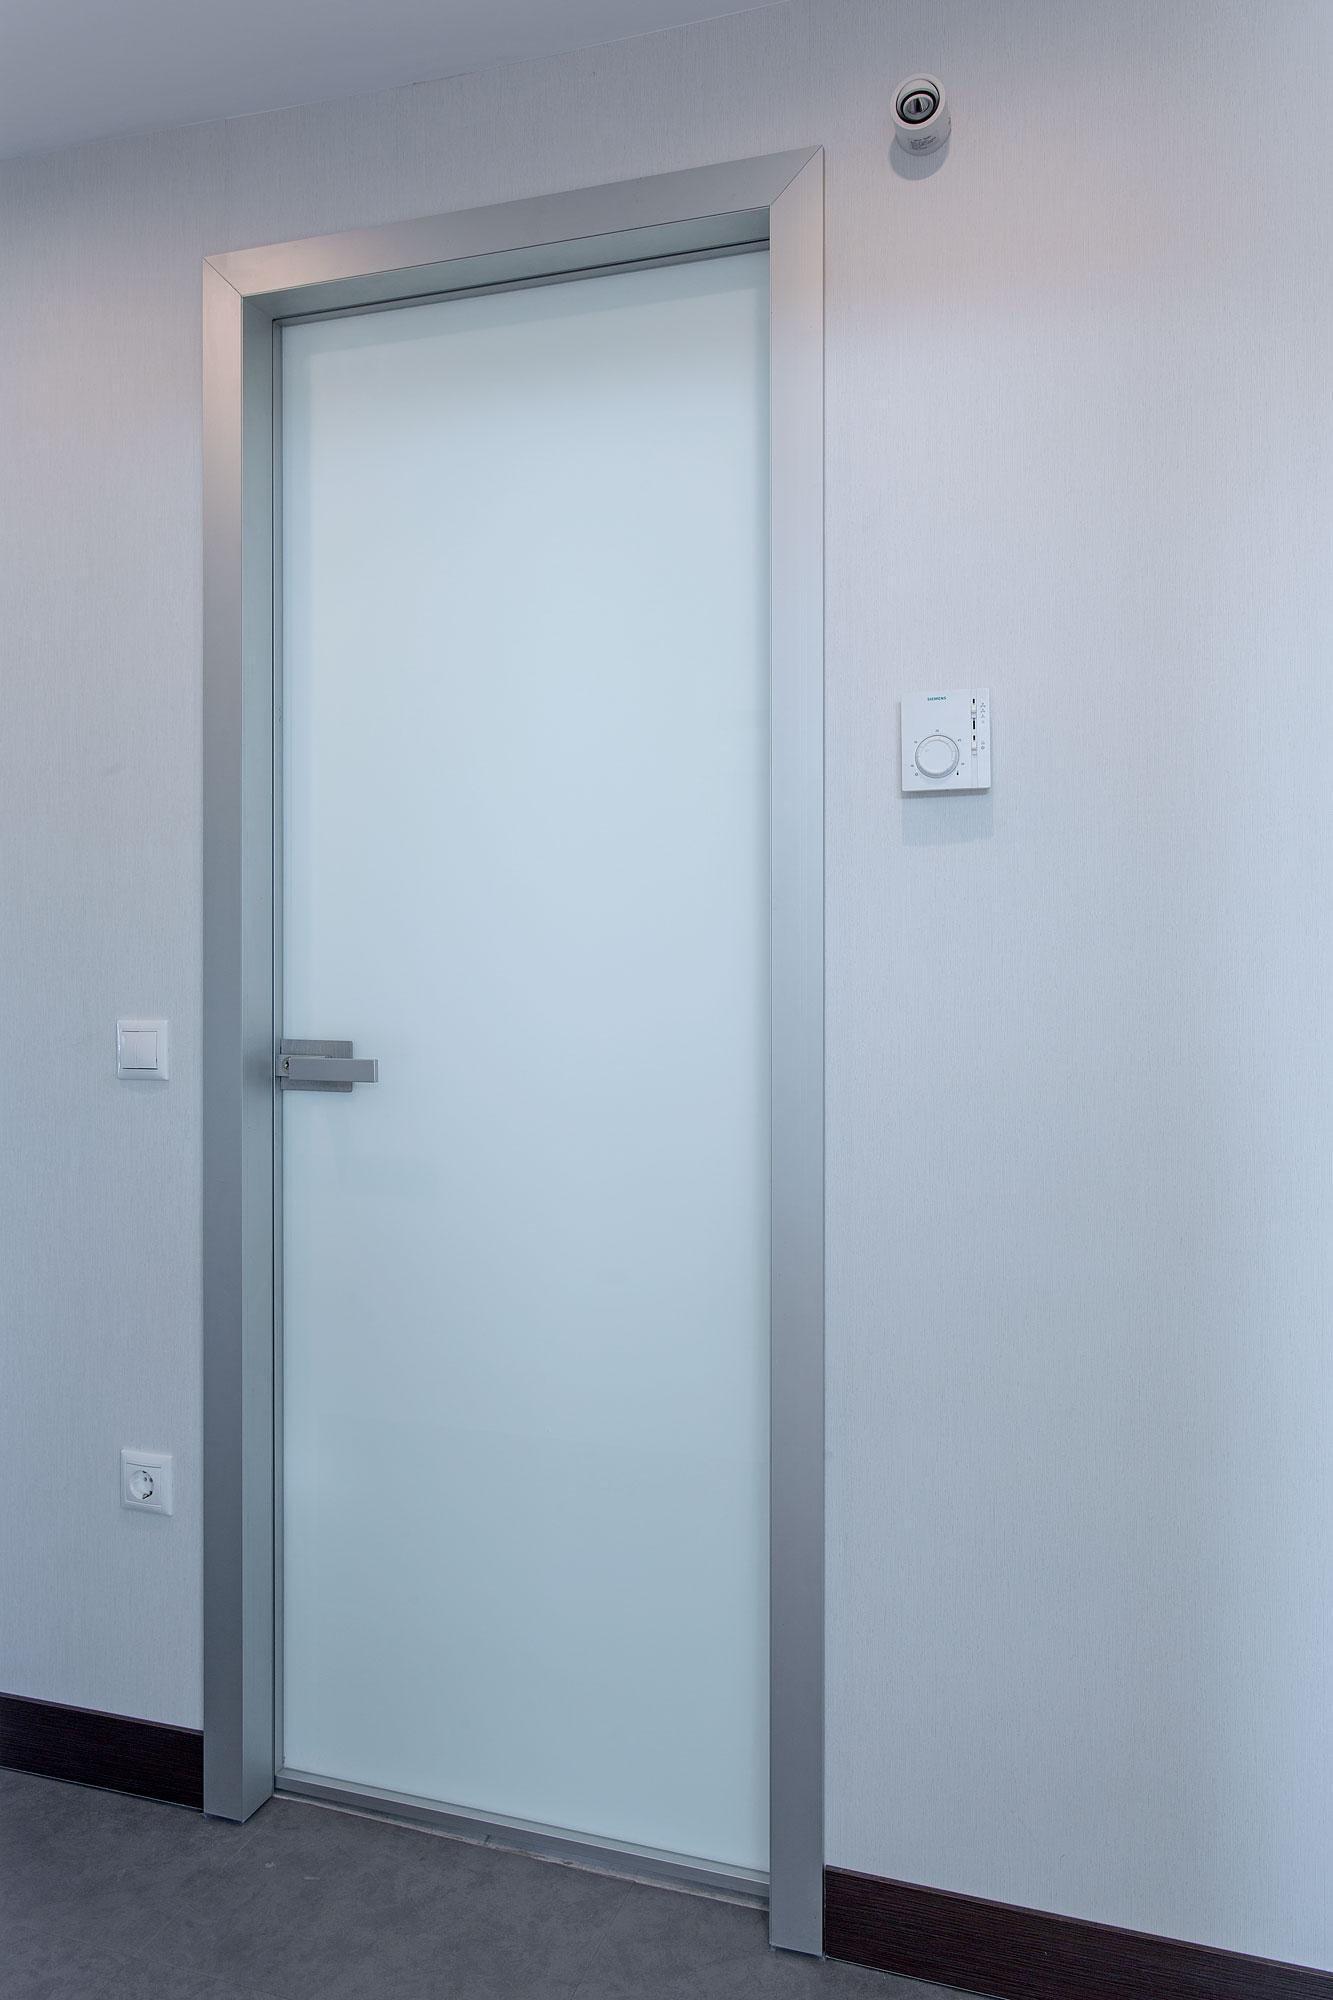 INTERNAL DOOR MINIMAL WITH ALUMINUM FRAME & WHITE GLASS